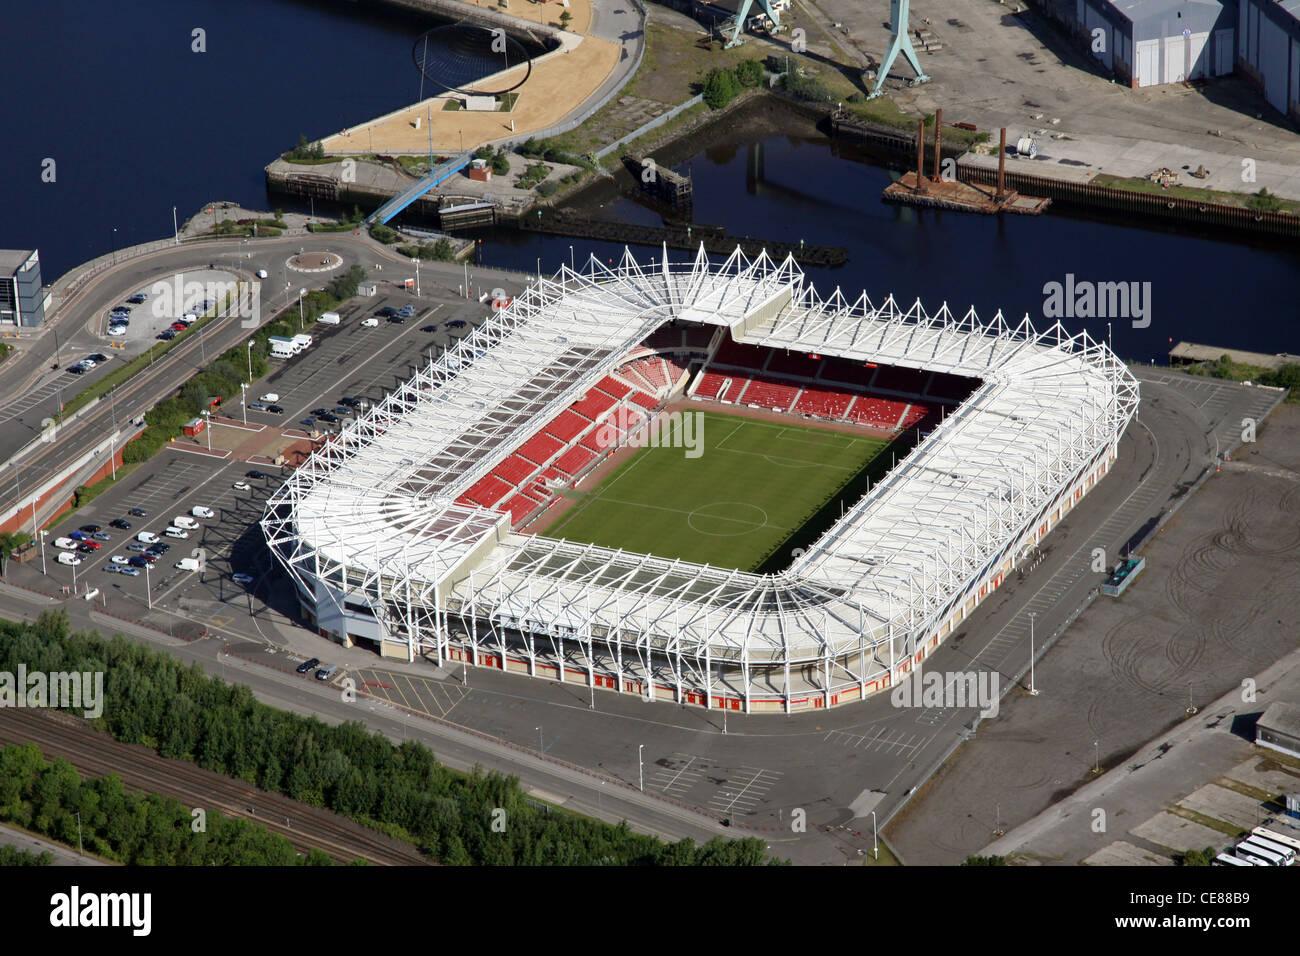 Aerial photograph of Middlesborough FC's Riverside Stadium - Stock Image